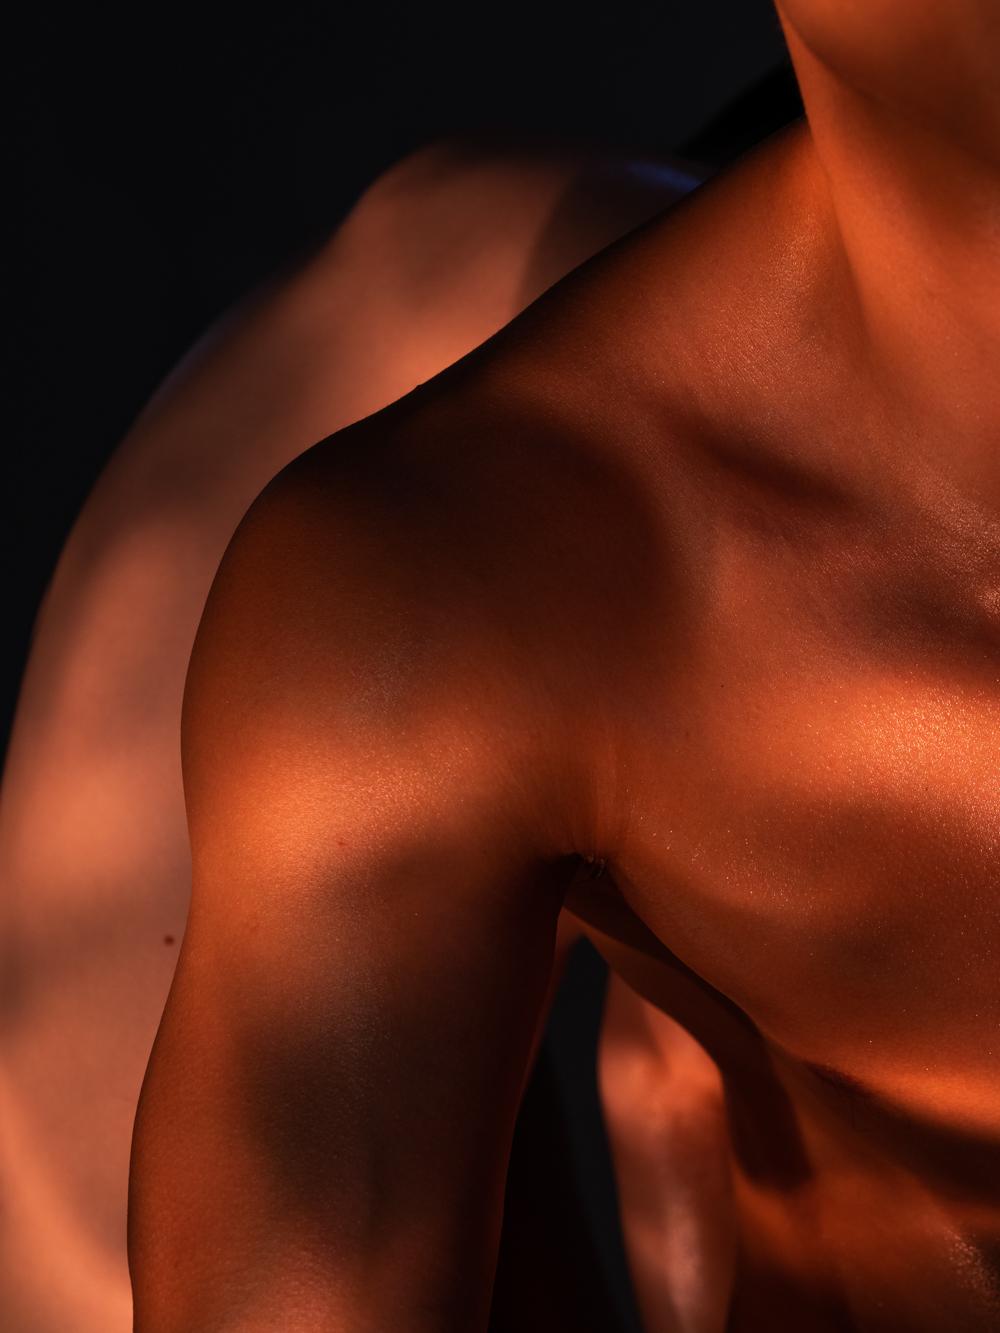 Ближе к телу: специальная съемка Louis Vuitton x BURO. (фото 13)